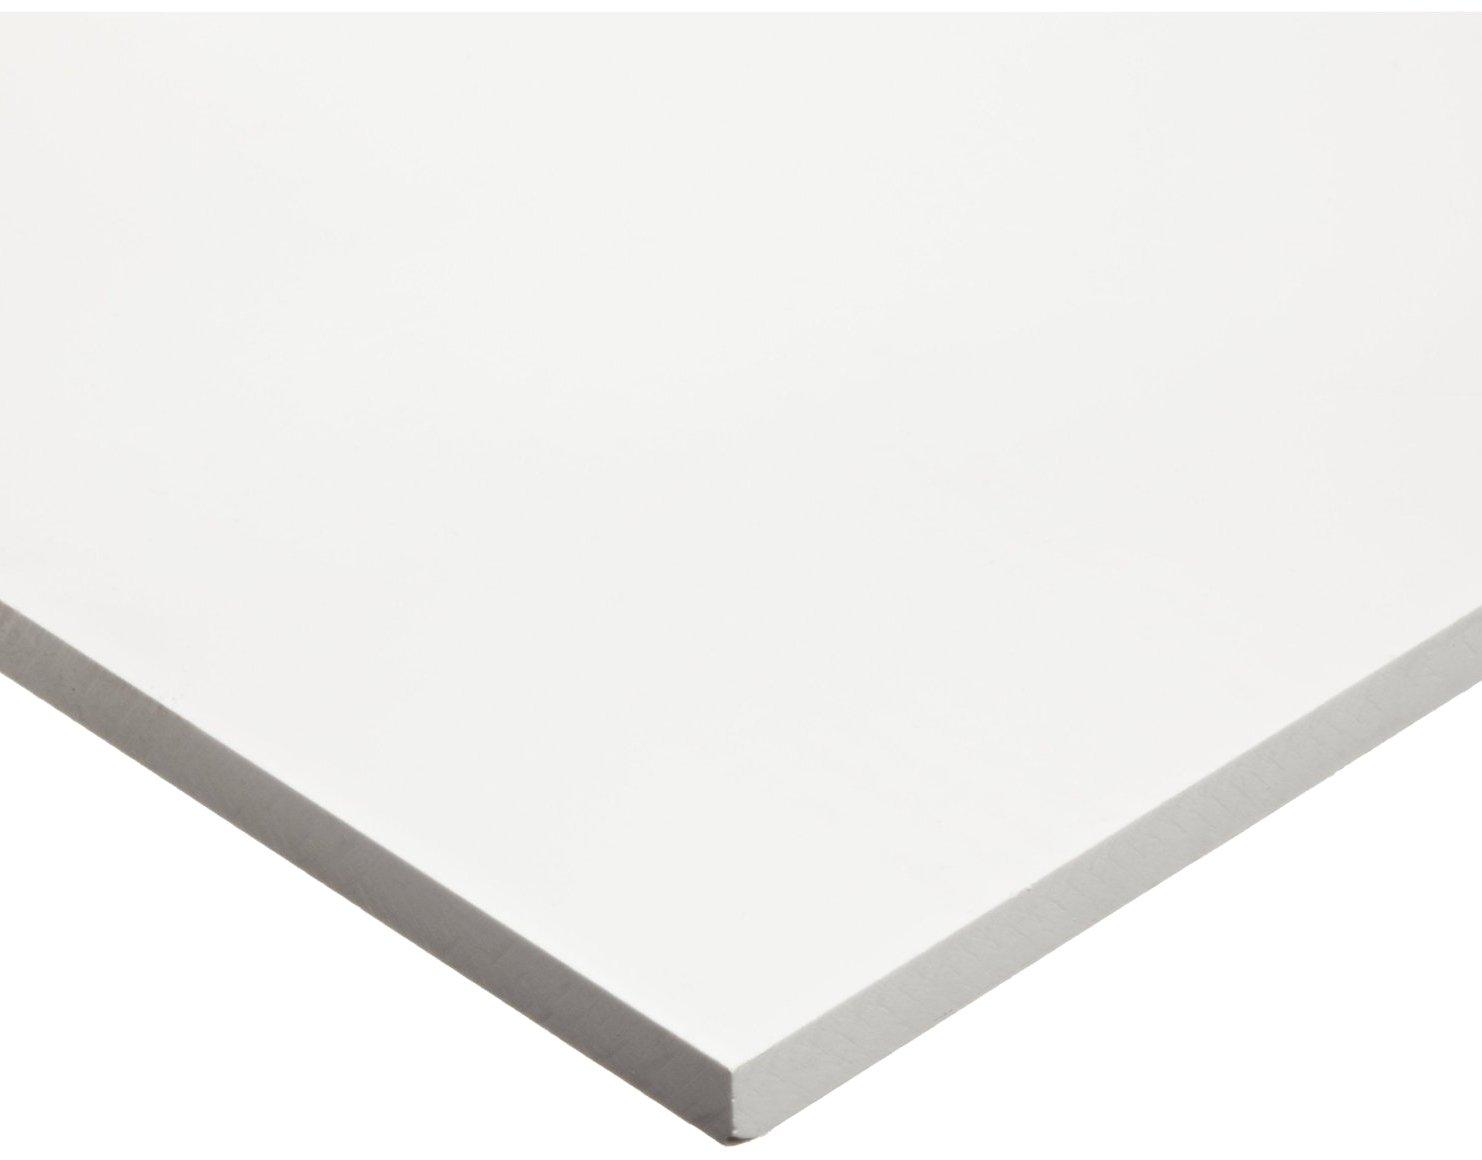 "Acrylic Sheet, Transparent Clear, Standard Tolerance, ASTM D788, 0.118"" Thickness, 24"" Width, 24"" Length"